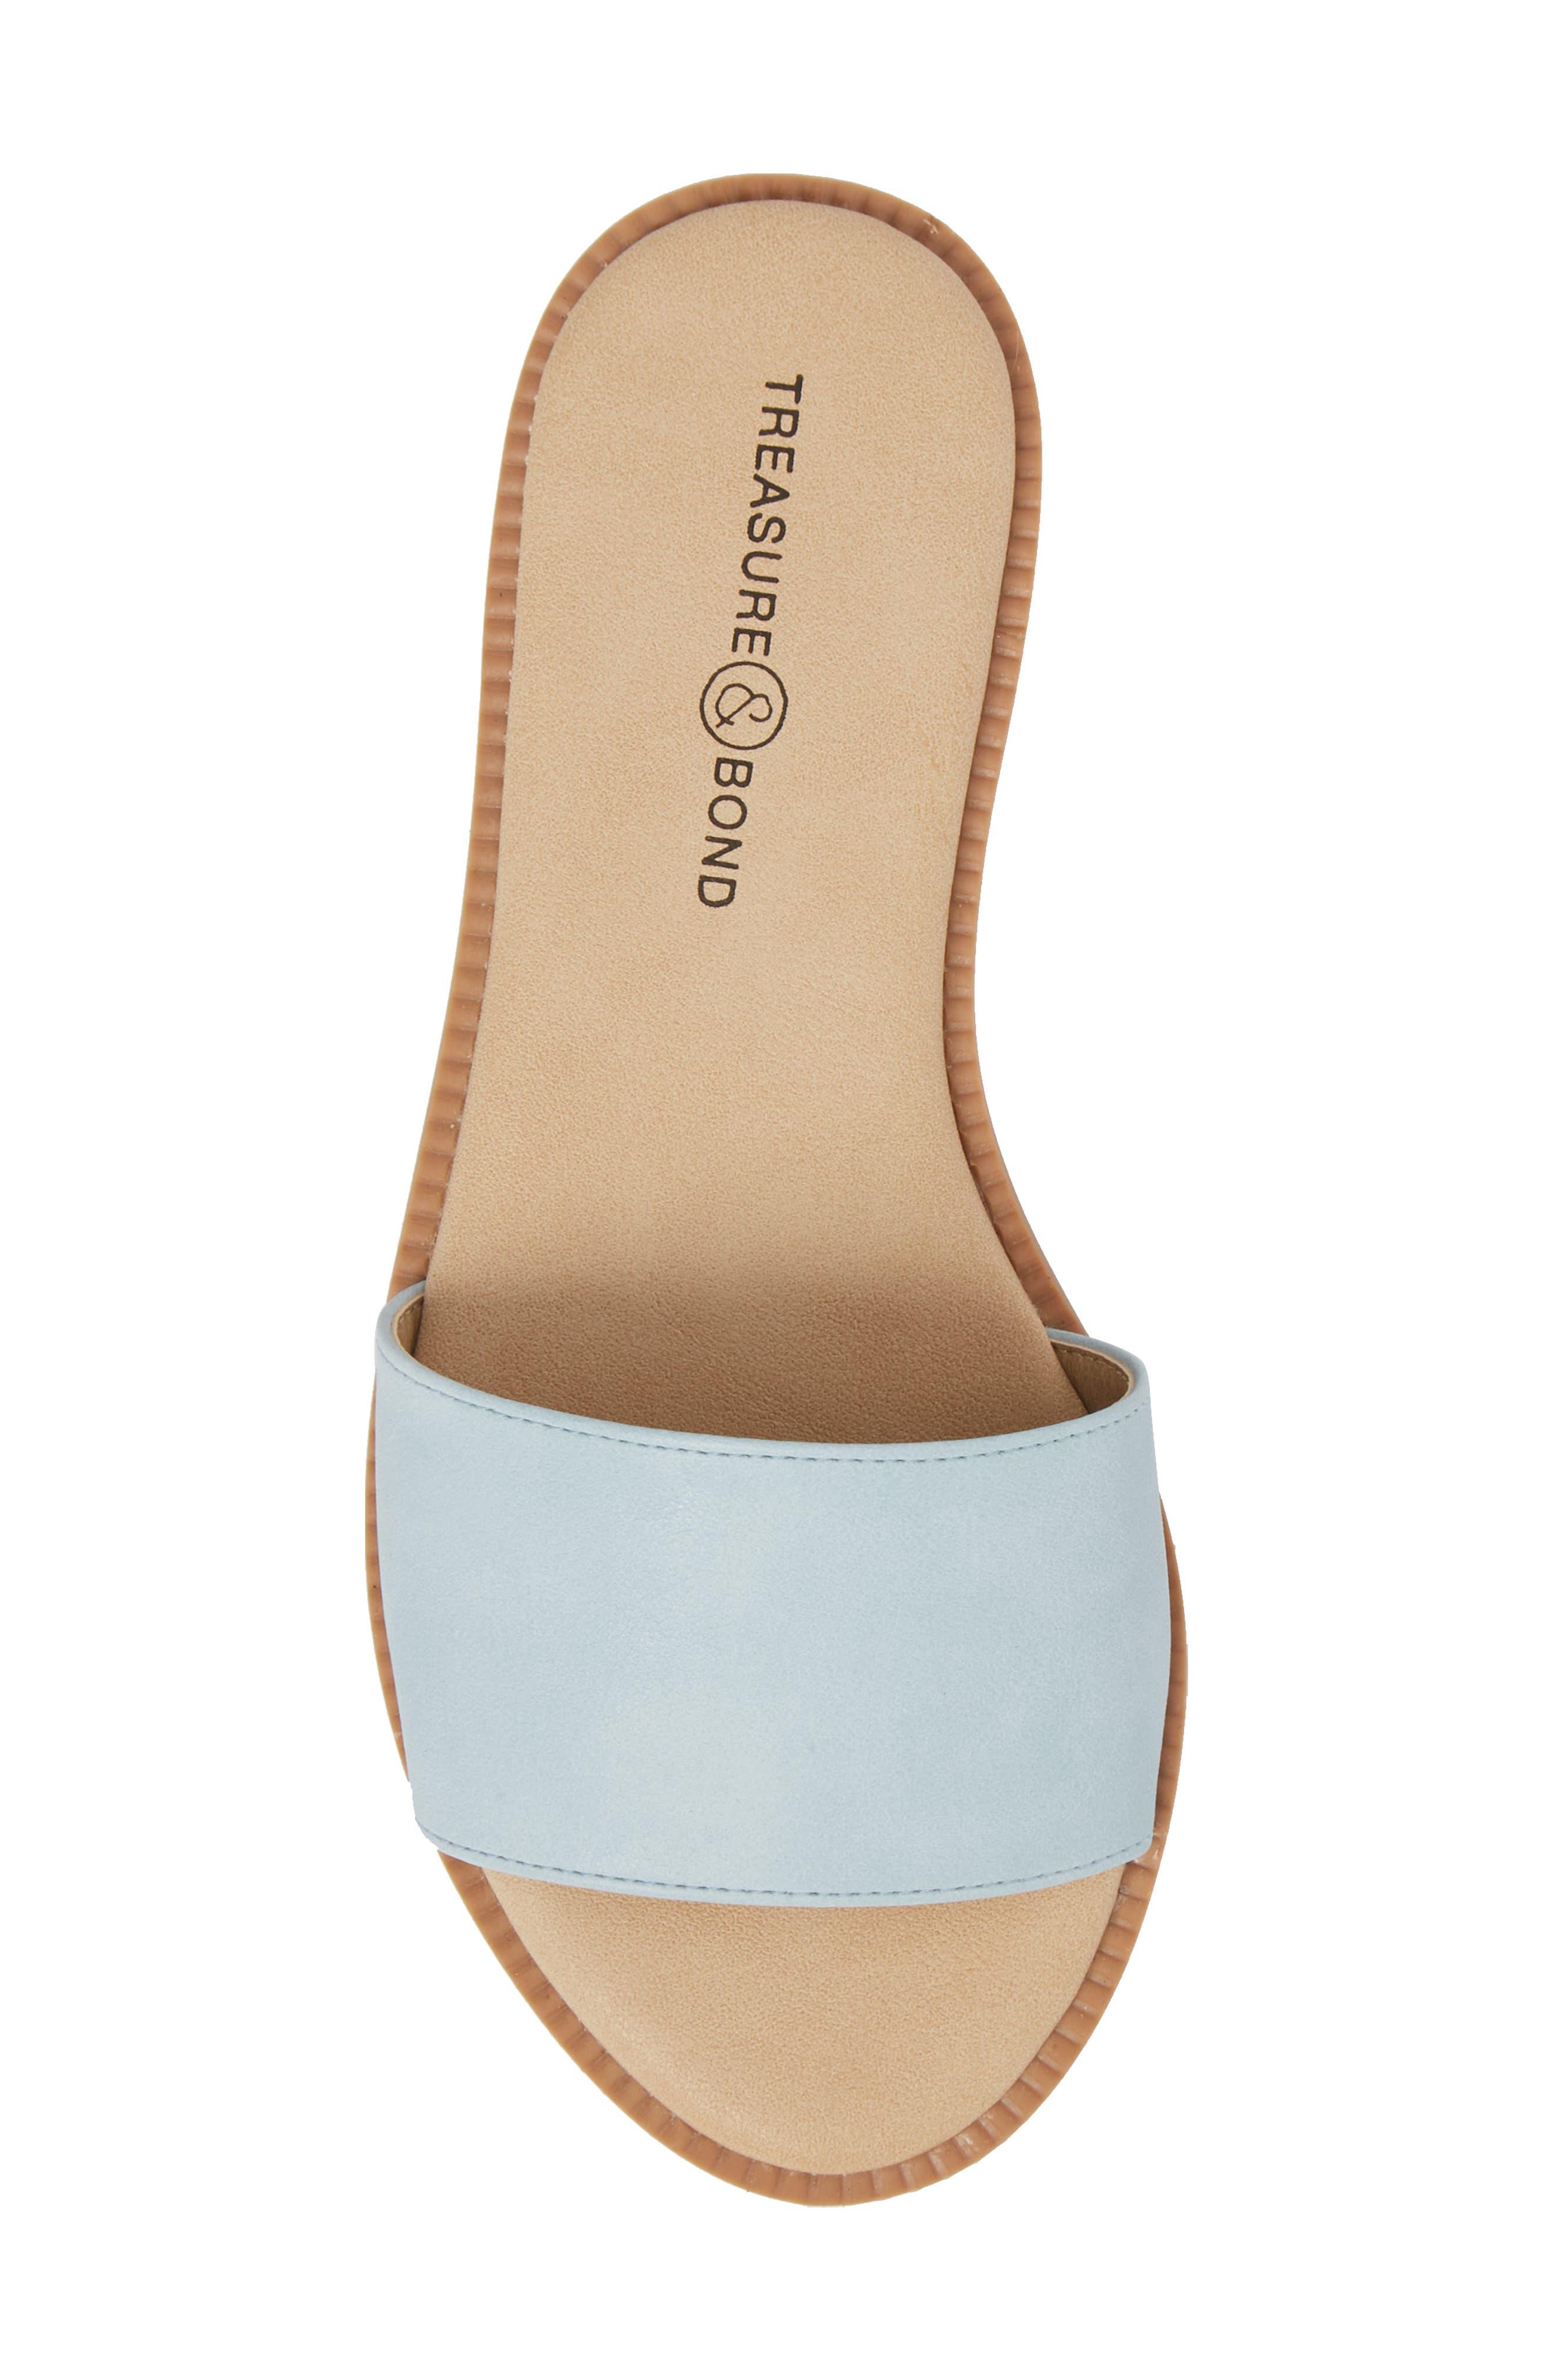 Mia Slide Sandal,                             Alternate thumbnail 5, color,                             Aqua Faux Leather